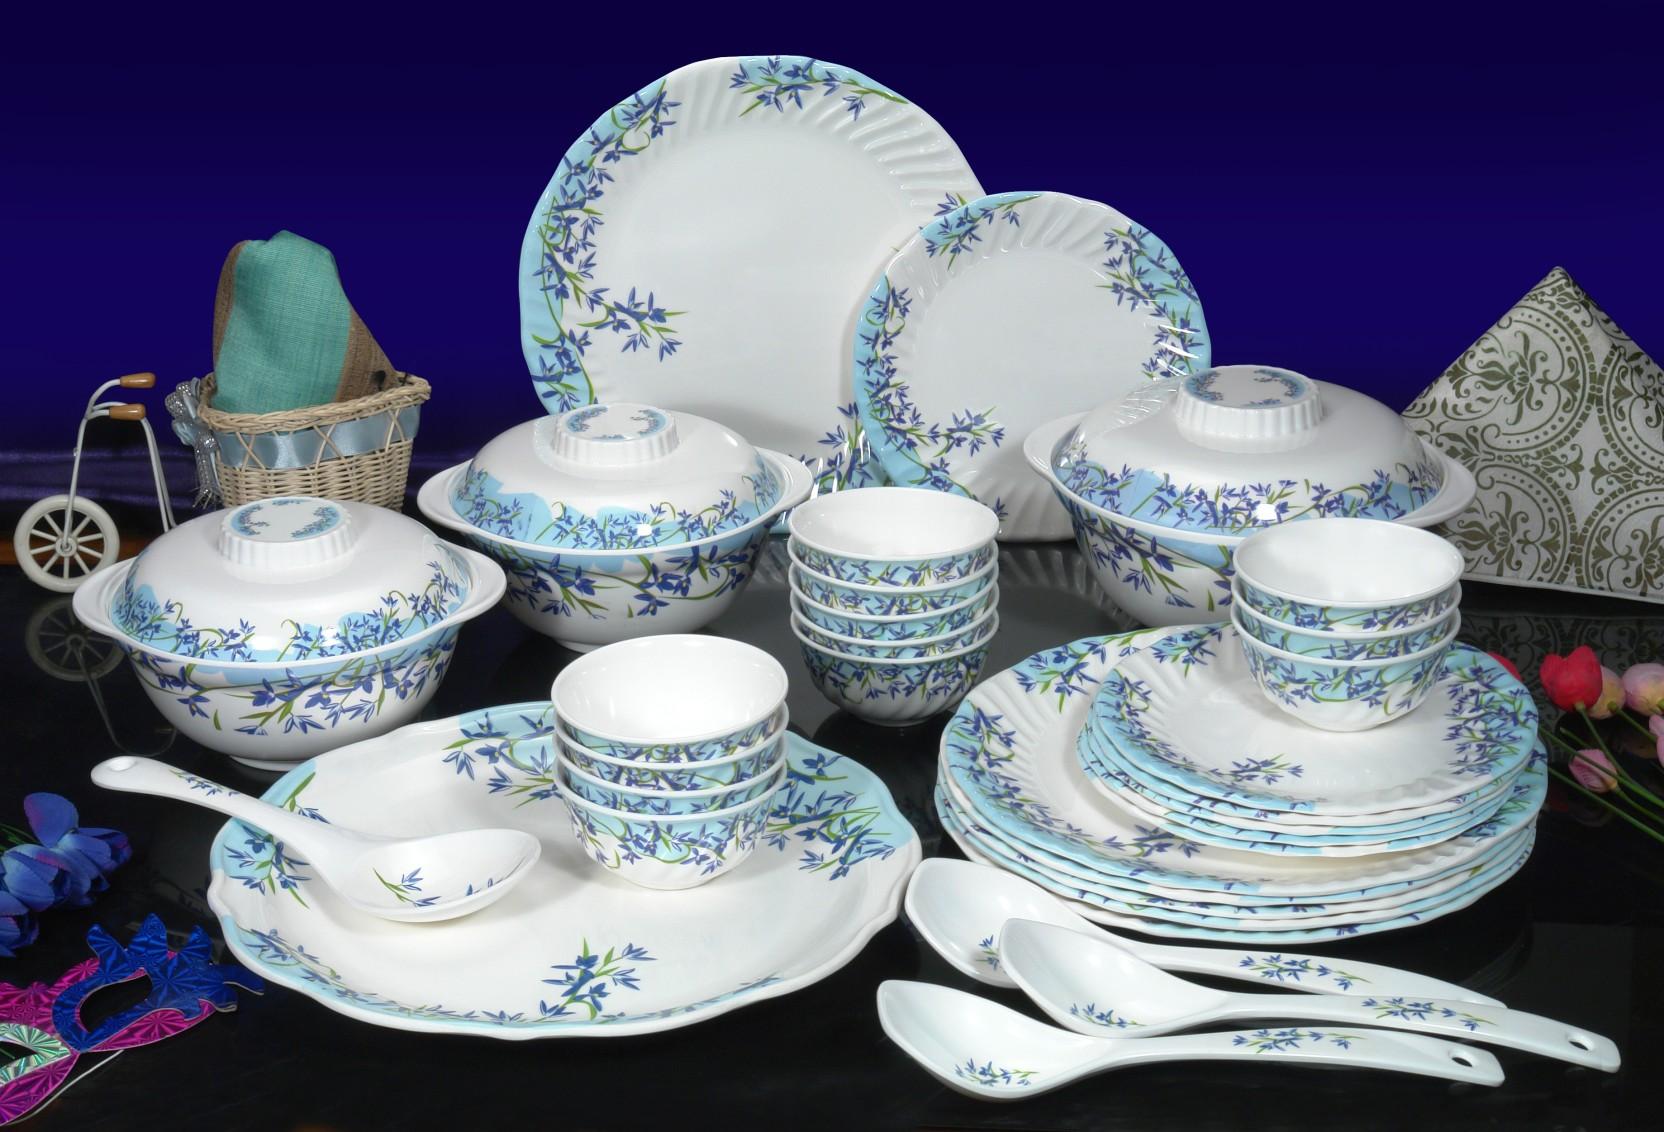 Machi Azure Flower Pack of 35 Dinner Set Price in India - Buy Machi ...